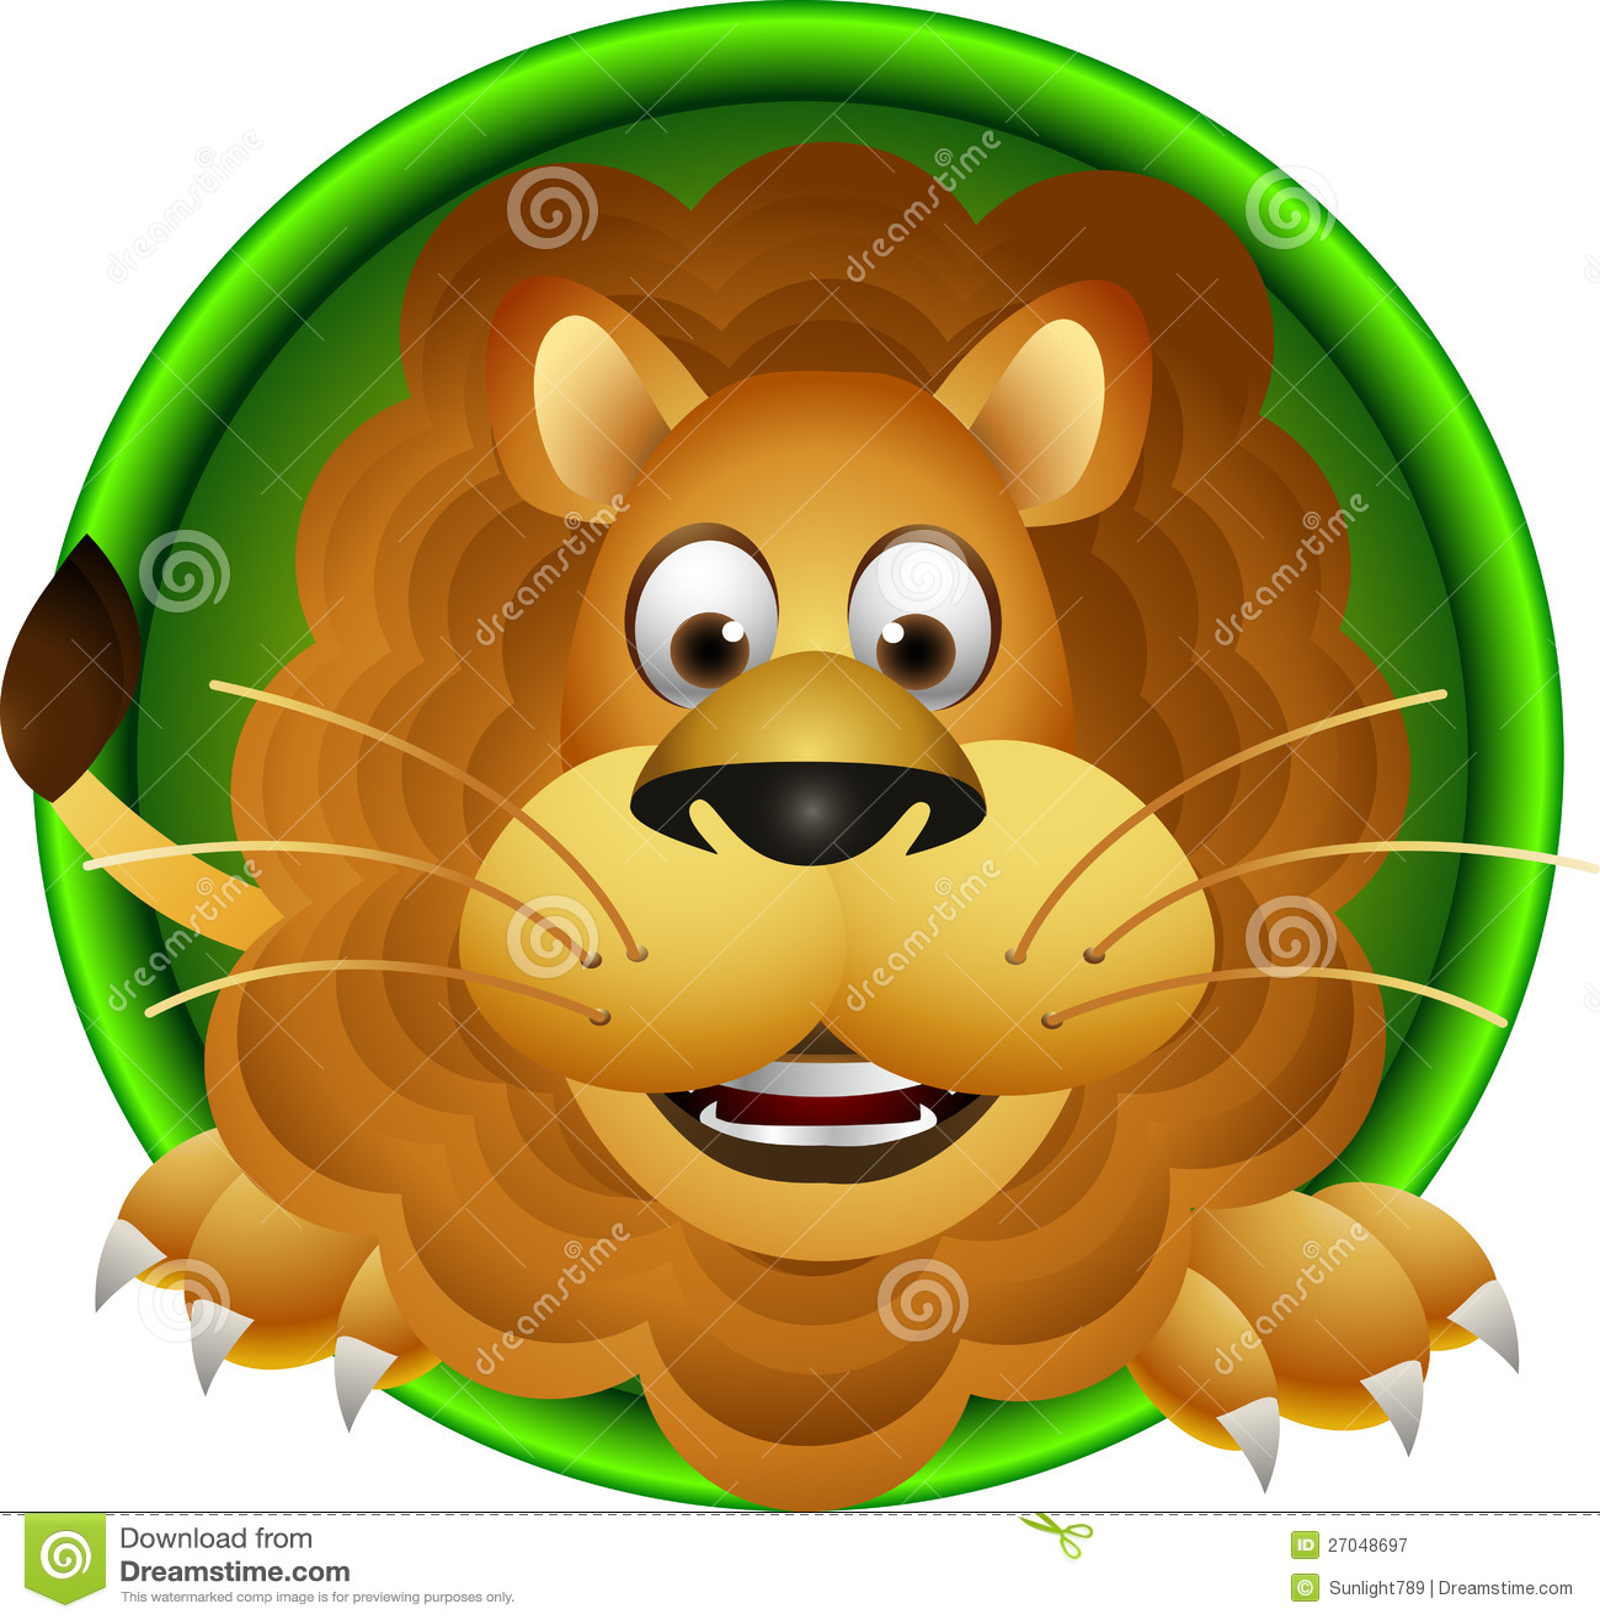 Lion cartoon head - photo#11